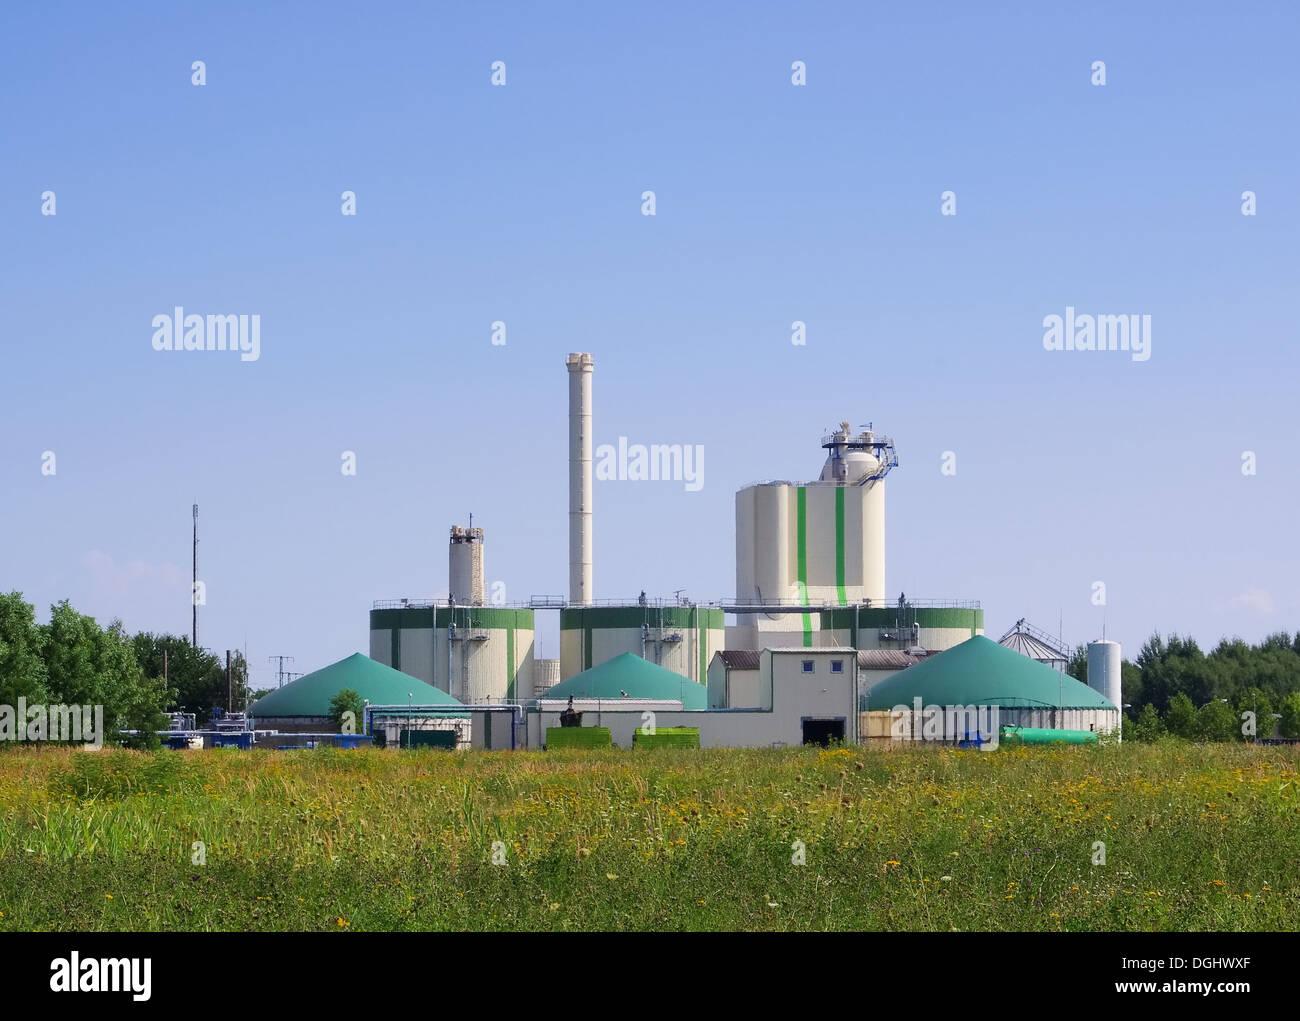 Biogasanlage - biogas plant 90 Stock Photo